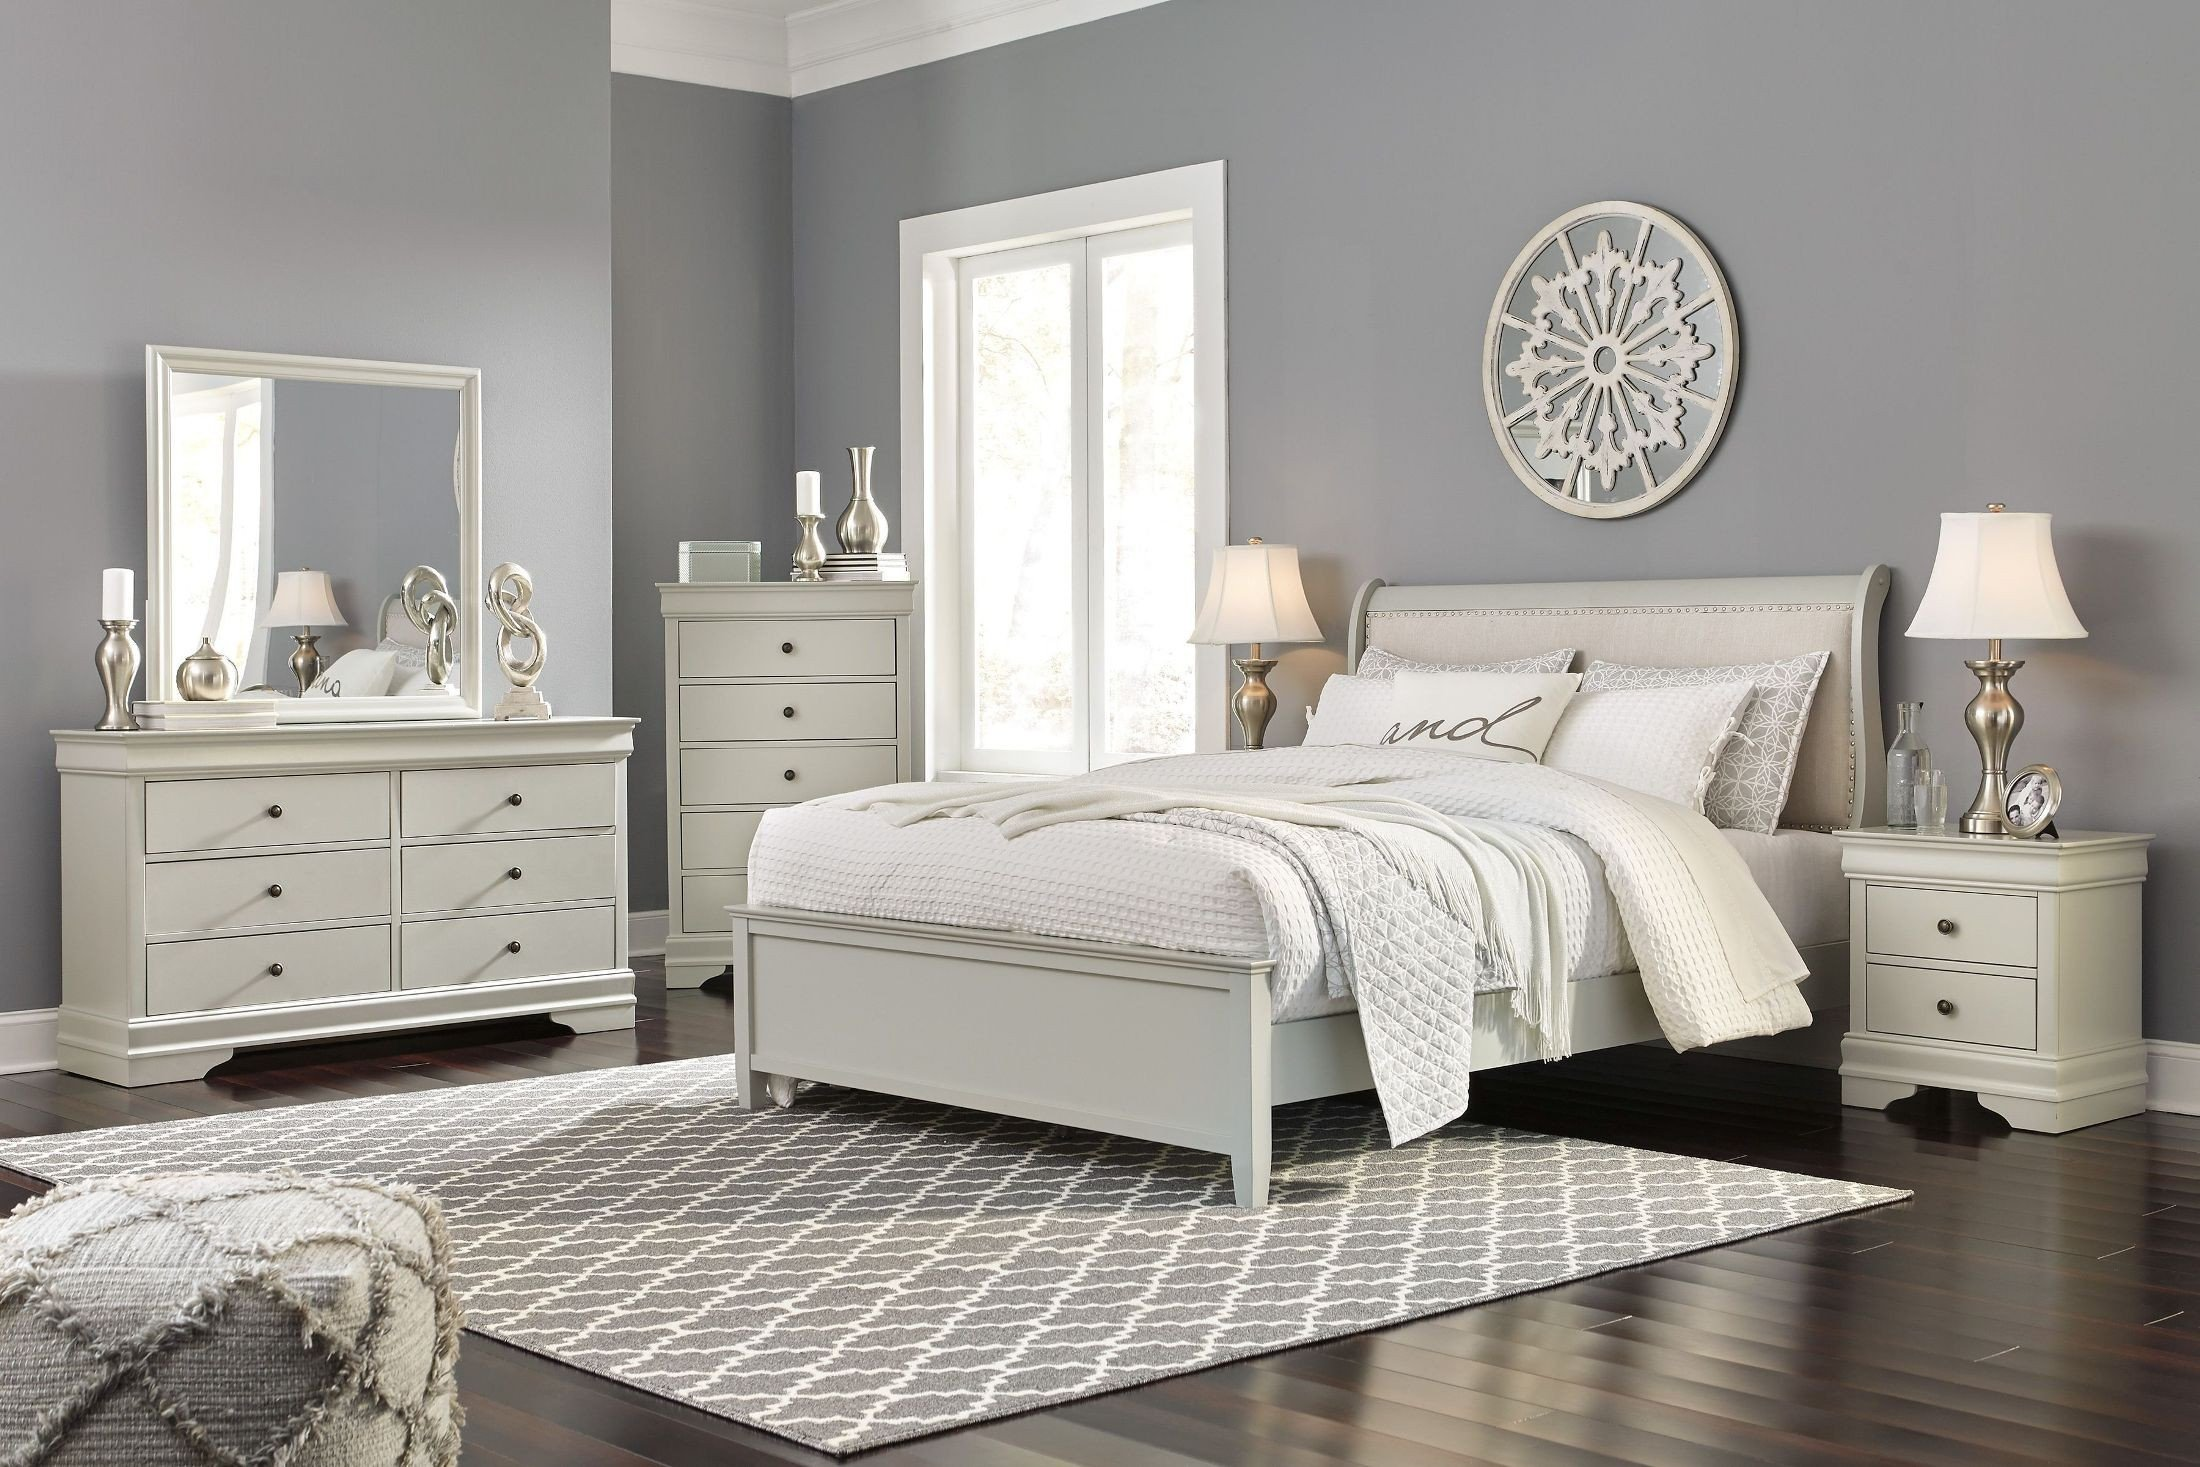 Mirrored Bedroom Furniture Set Best Of Emma Mason Signature Jarred 5 Piece Sleigh Bedroom Set In Gray